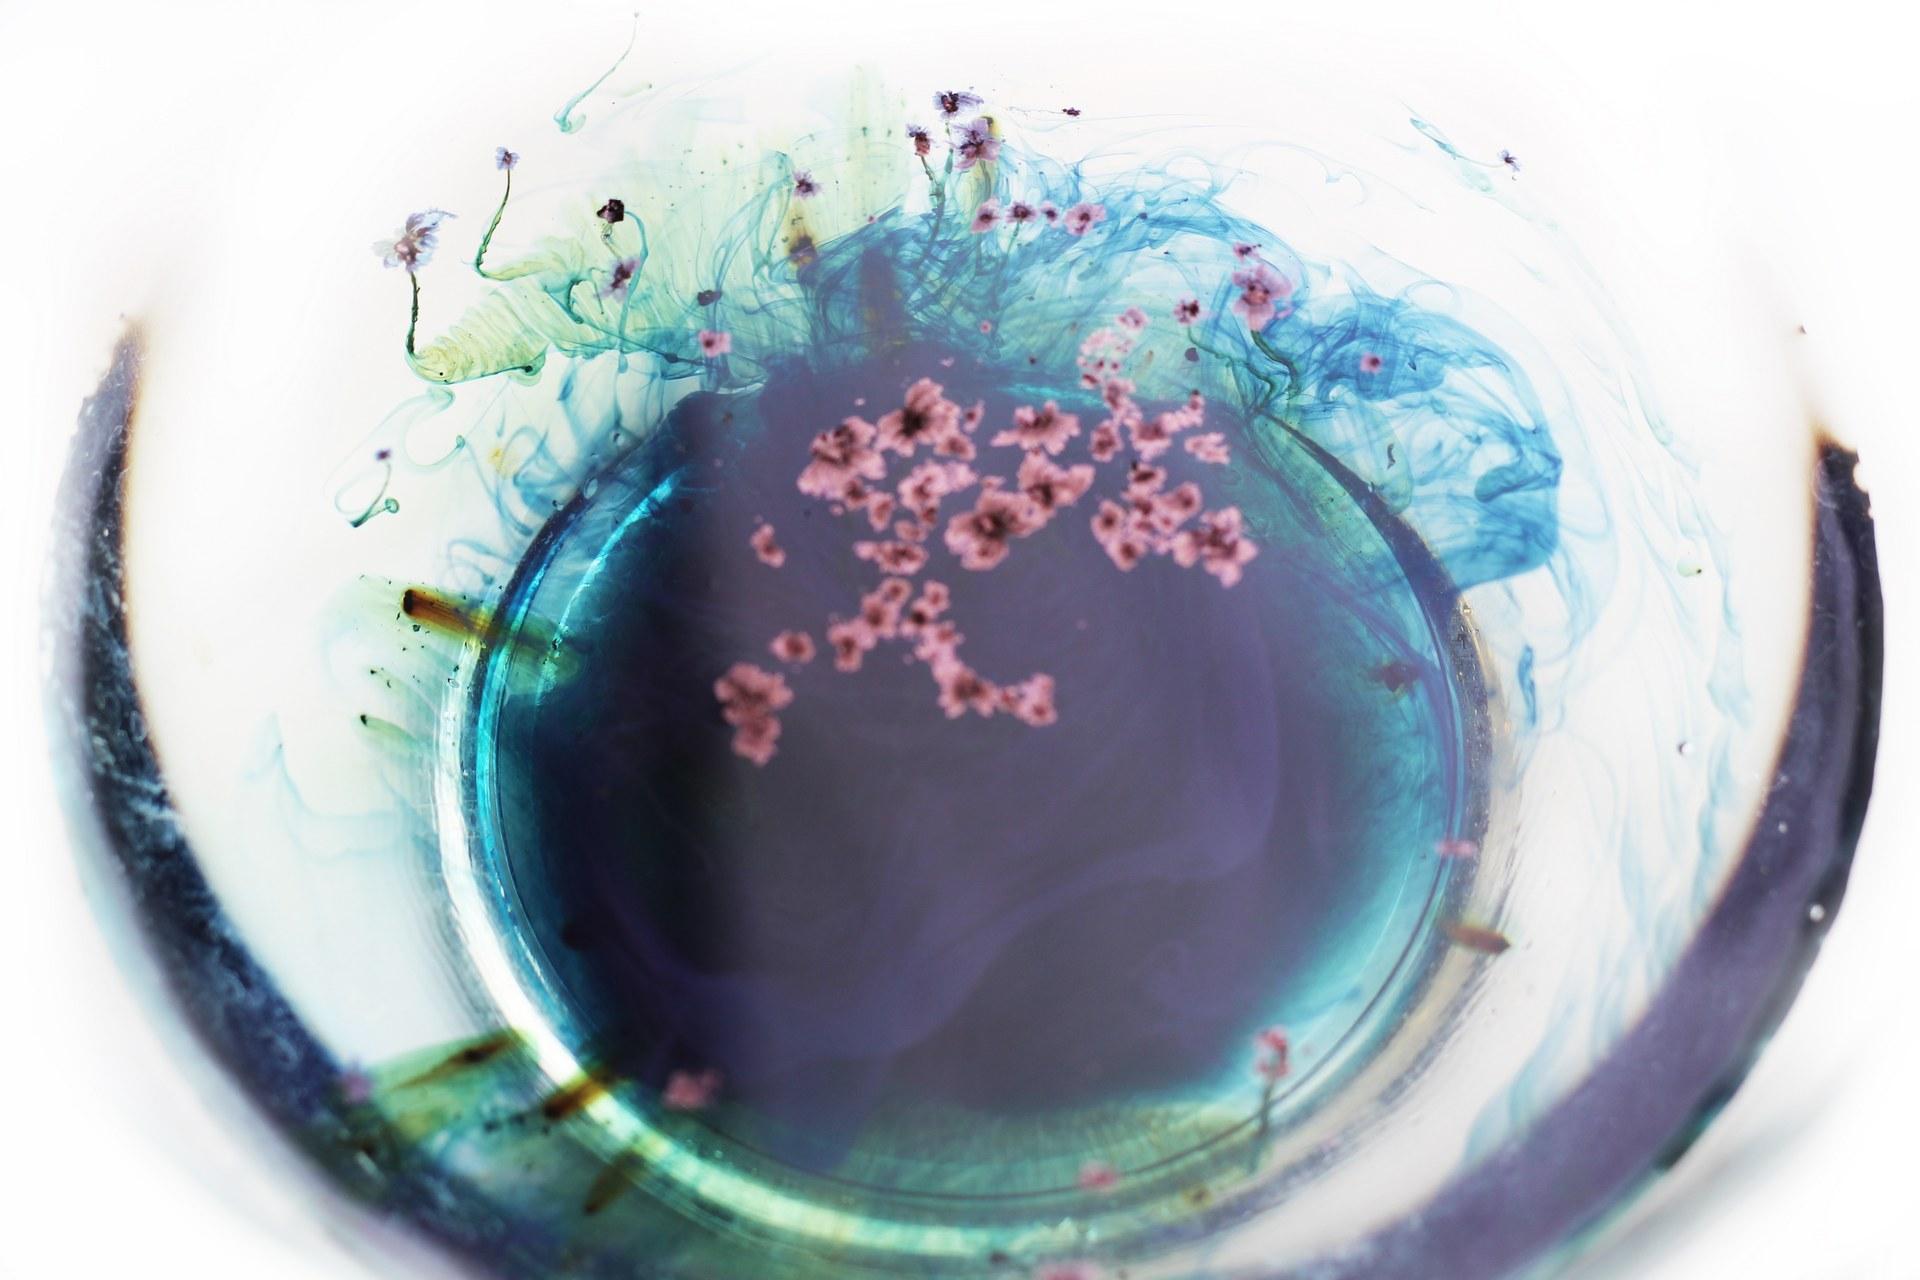 Indigo bath with flower patterns once powder submerges water